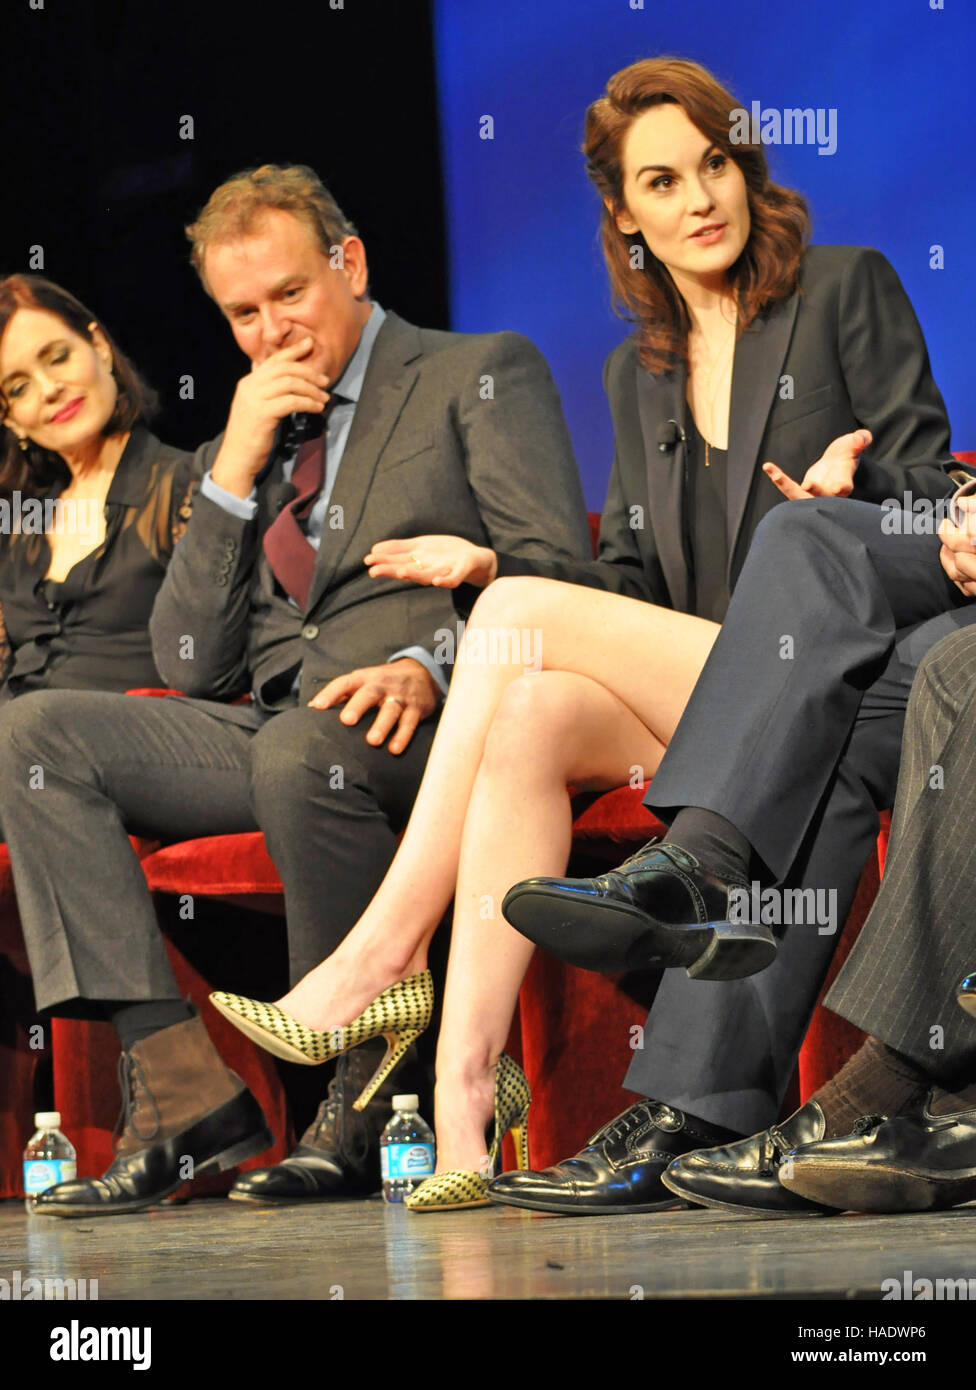 NY, NY. December 8 2015.  Elizabeth McGovern, Hugh Bonneville, & Michelle Dockery.'Downtown Abbey' panel. - Stock Image